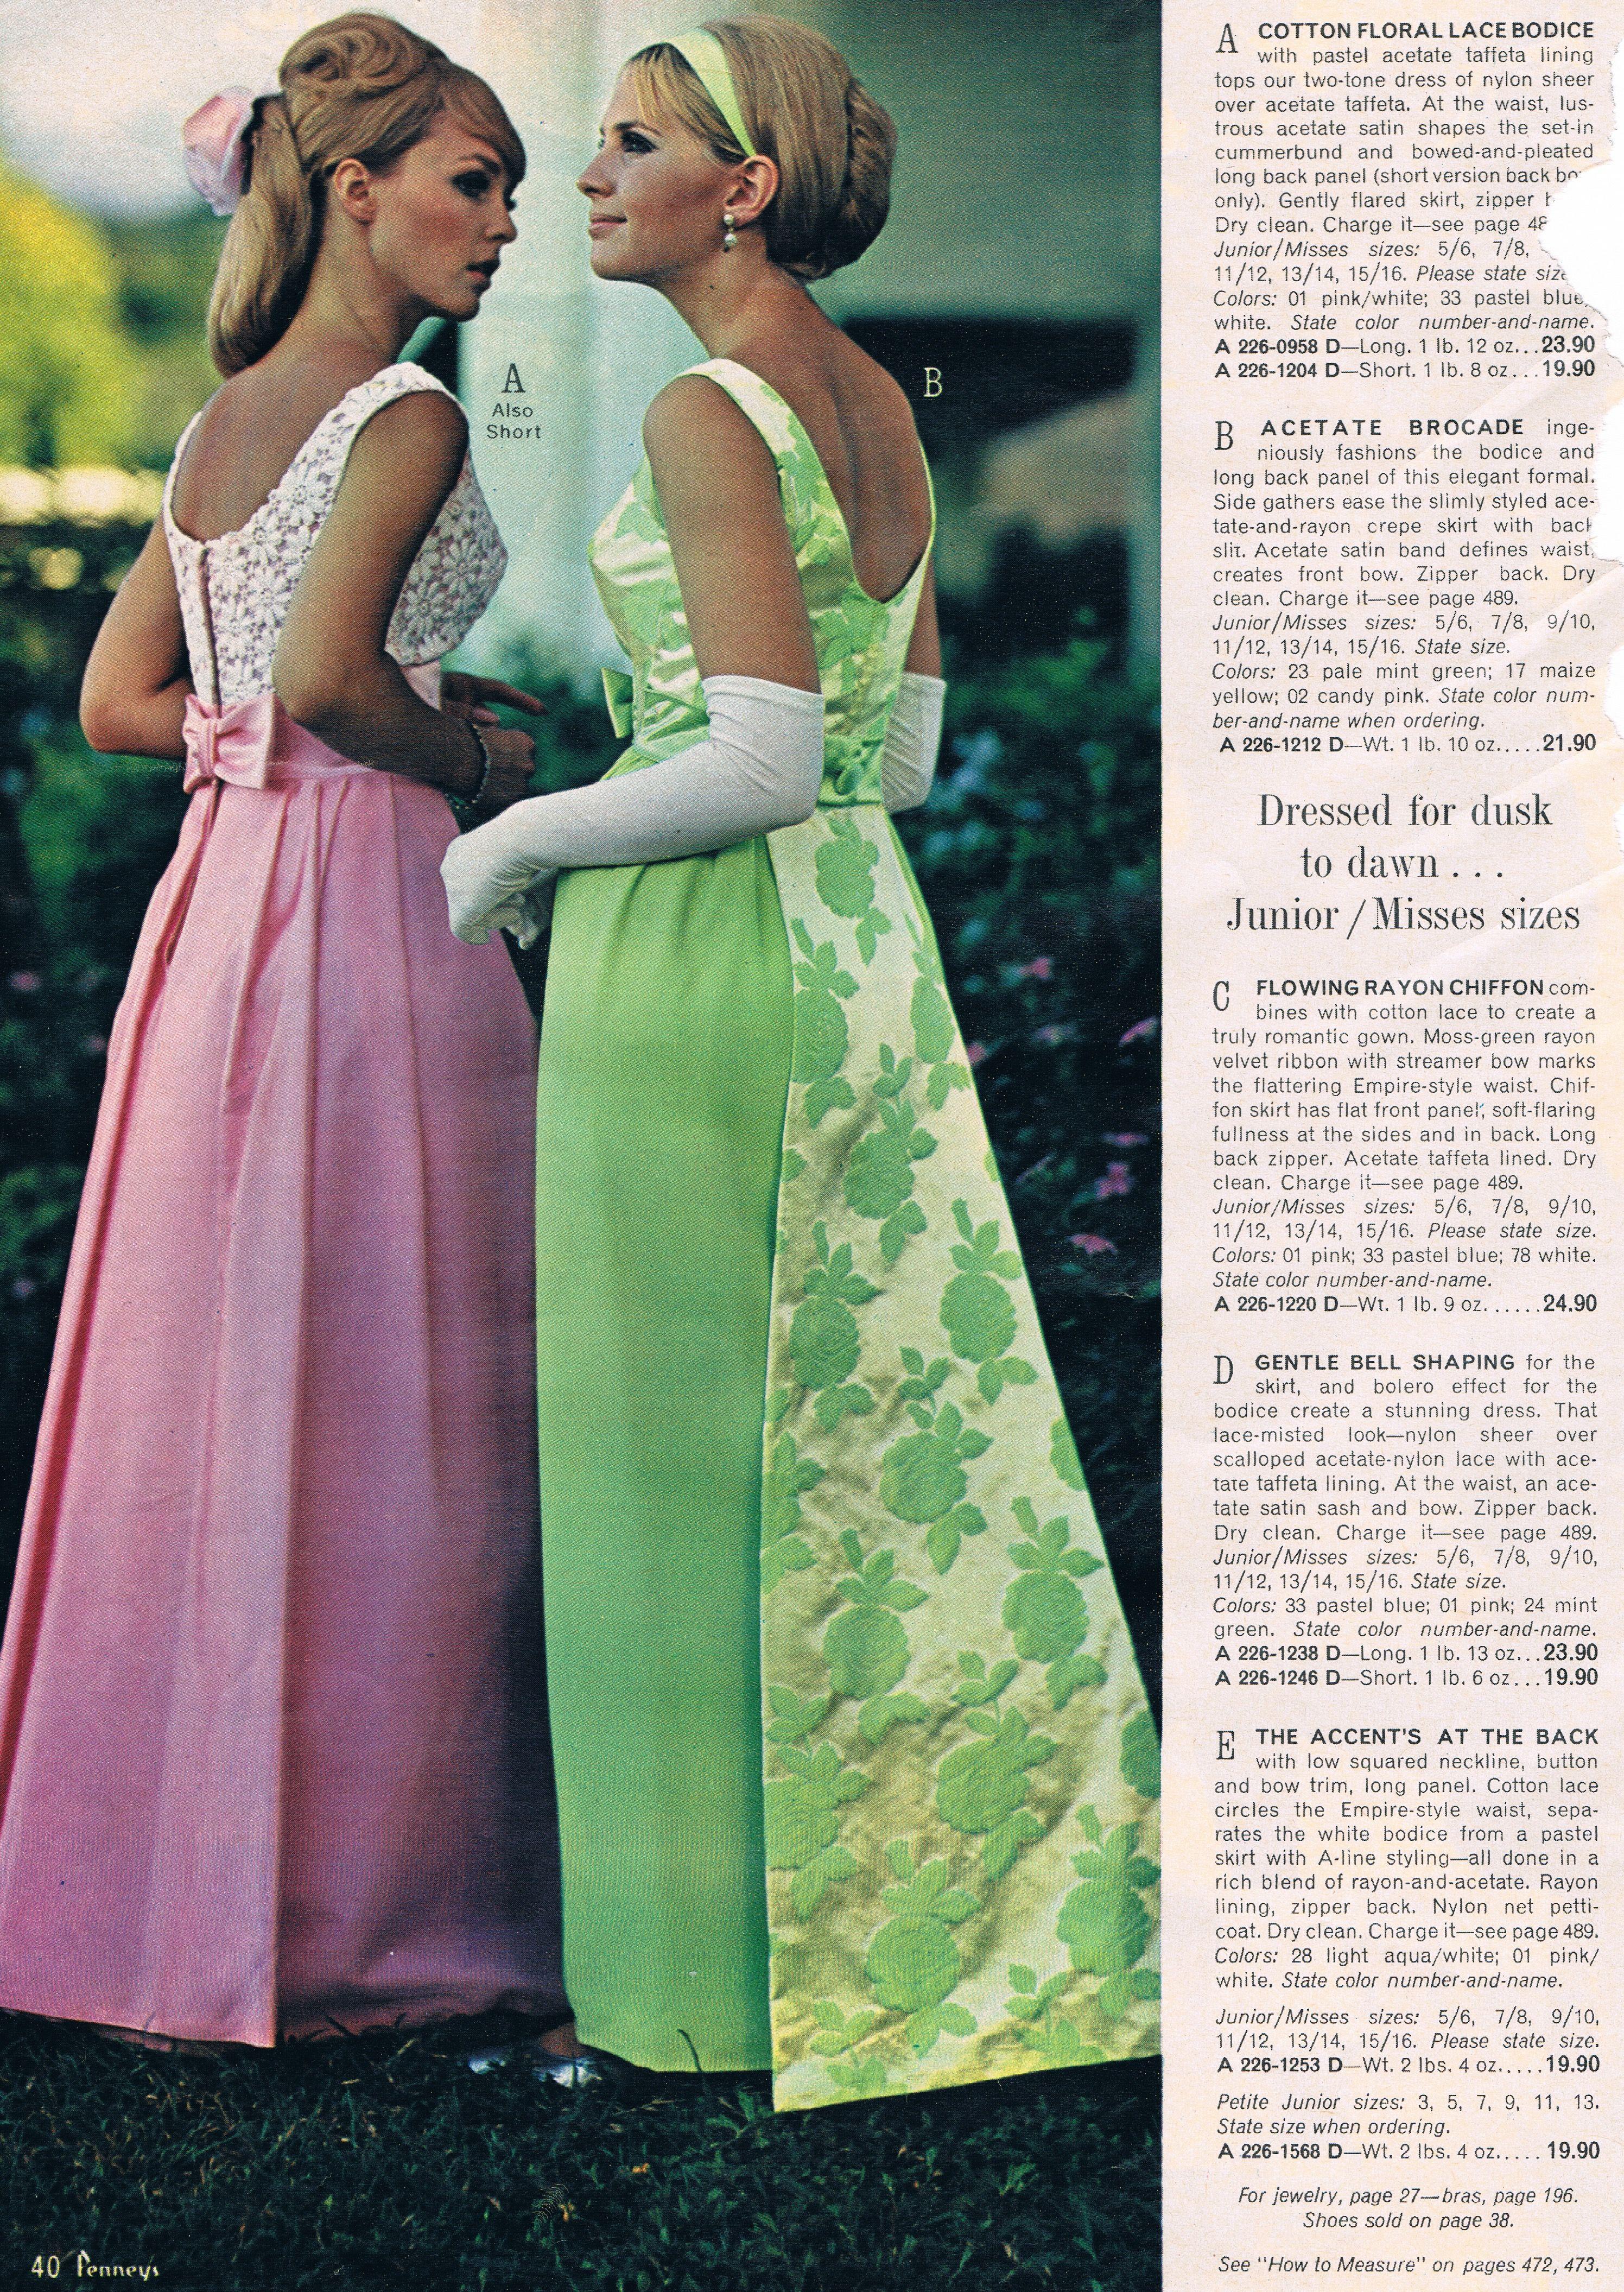 Penneys Catalog 60s Prom Trends Vintage Dresses Vintage Style Prom Dresses [ 4222 x 2992 Pixel ]